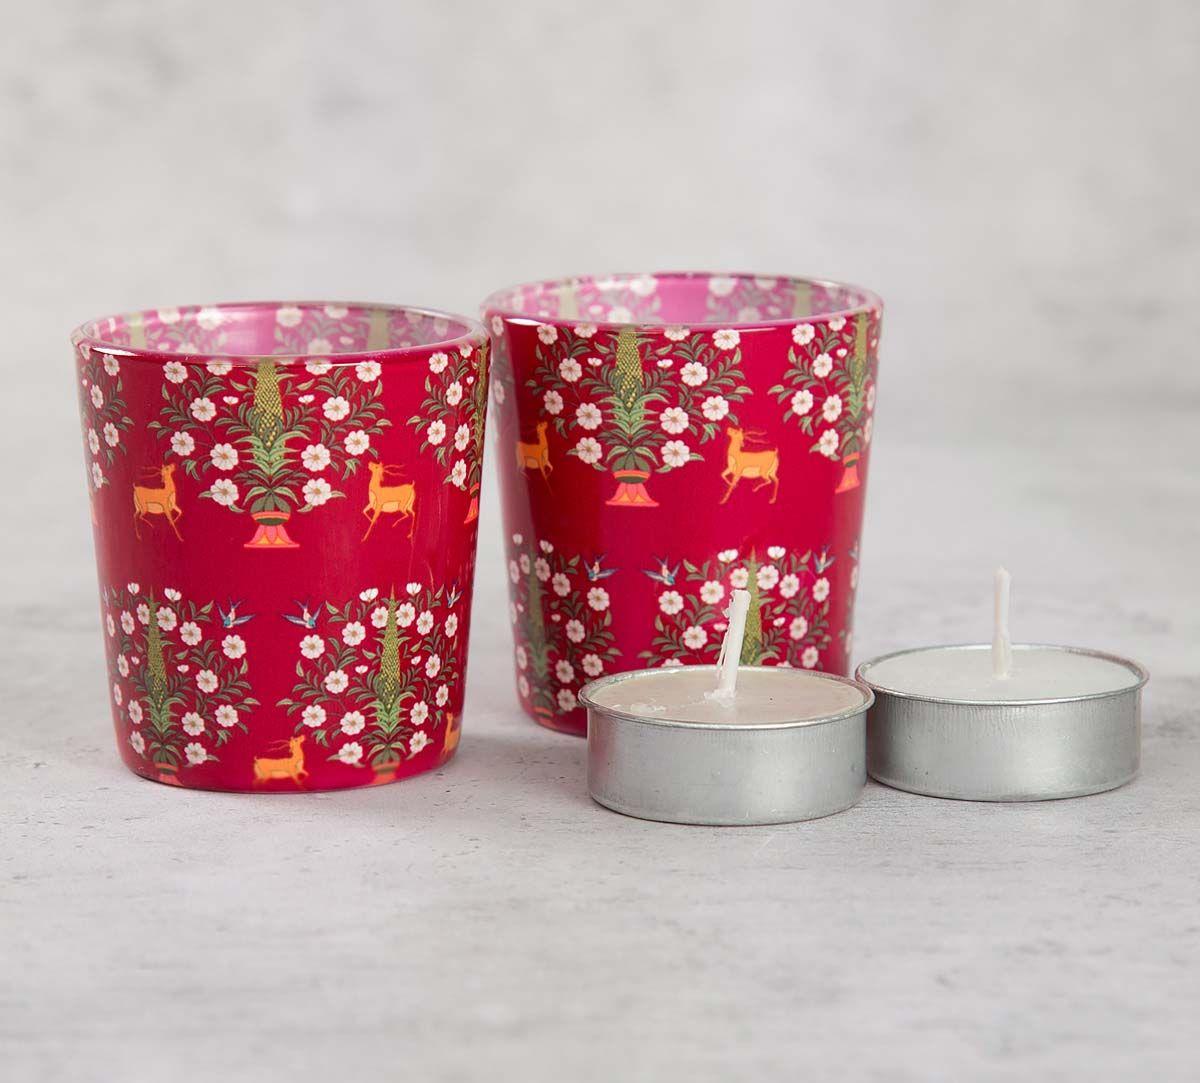 India Cirucs Deer and Conifer Garden Tea Light Holder Set of 2